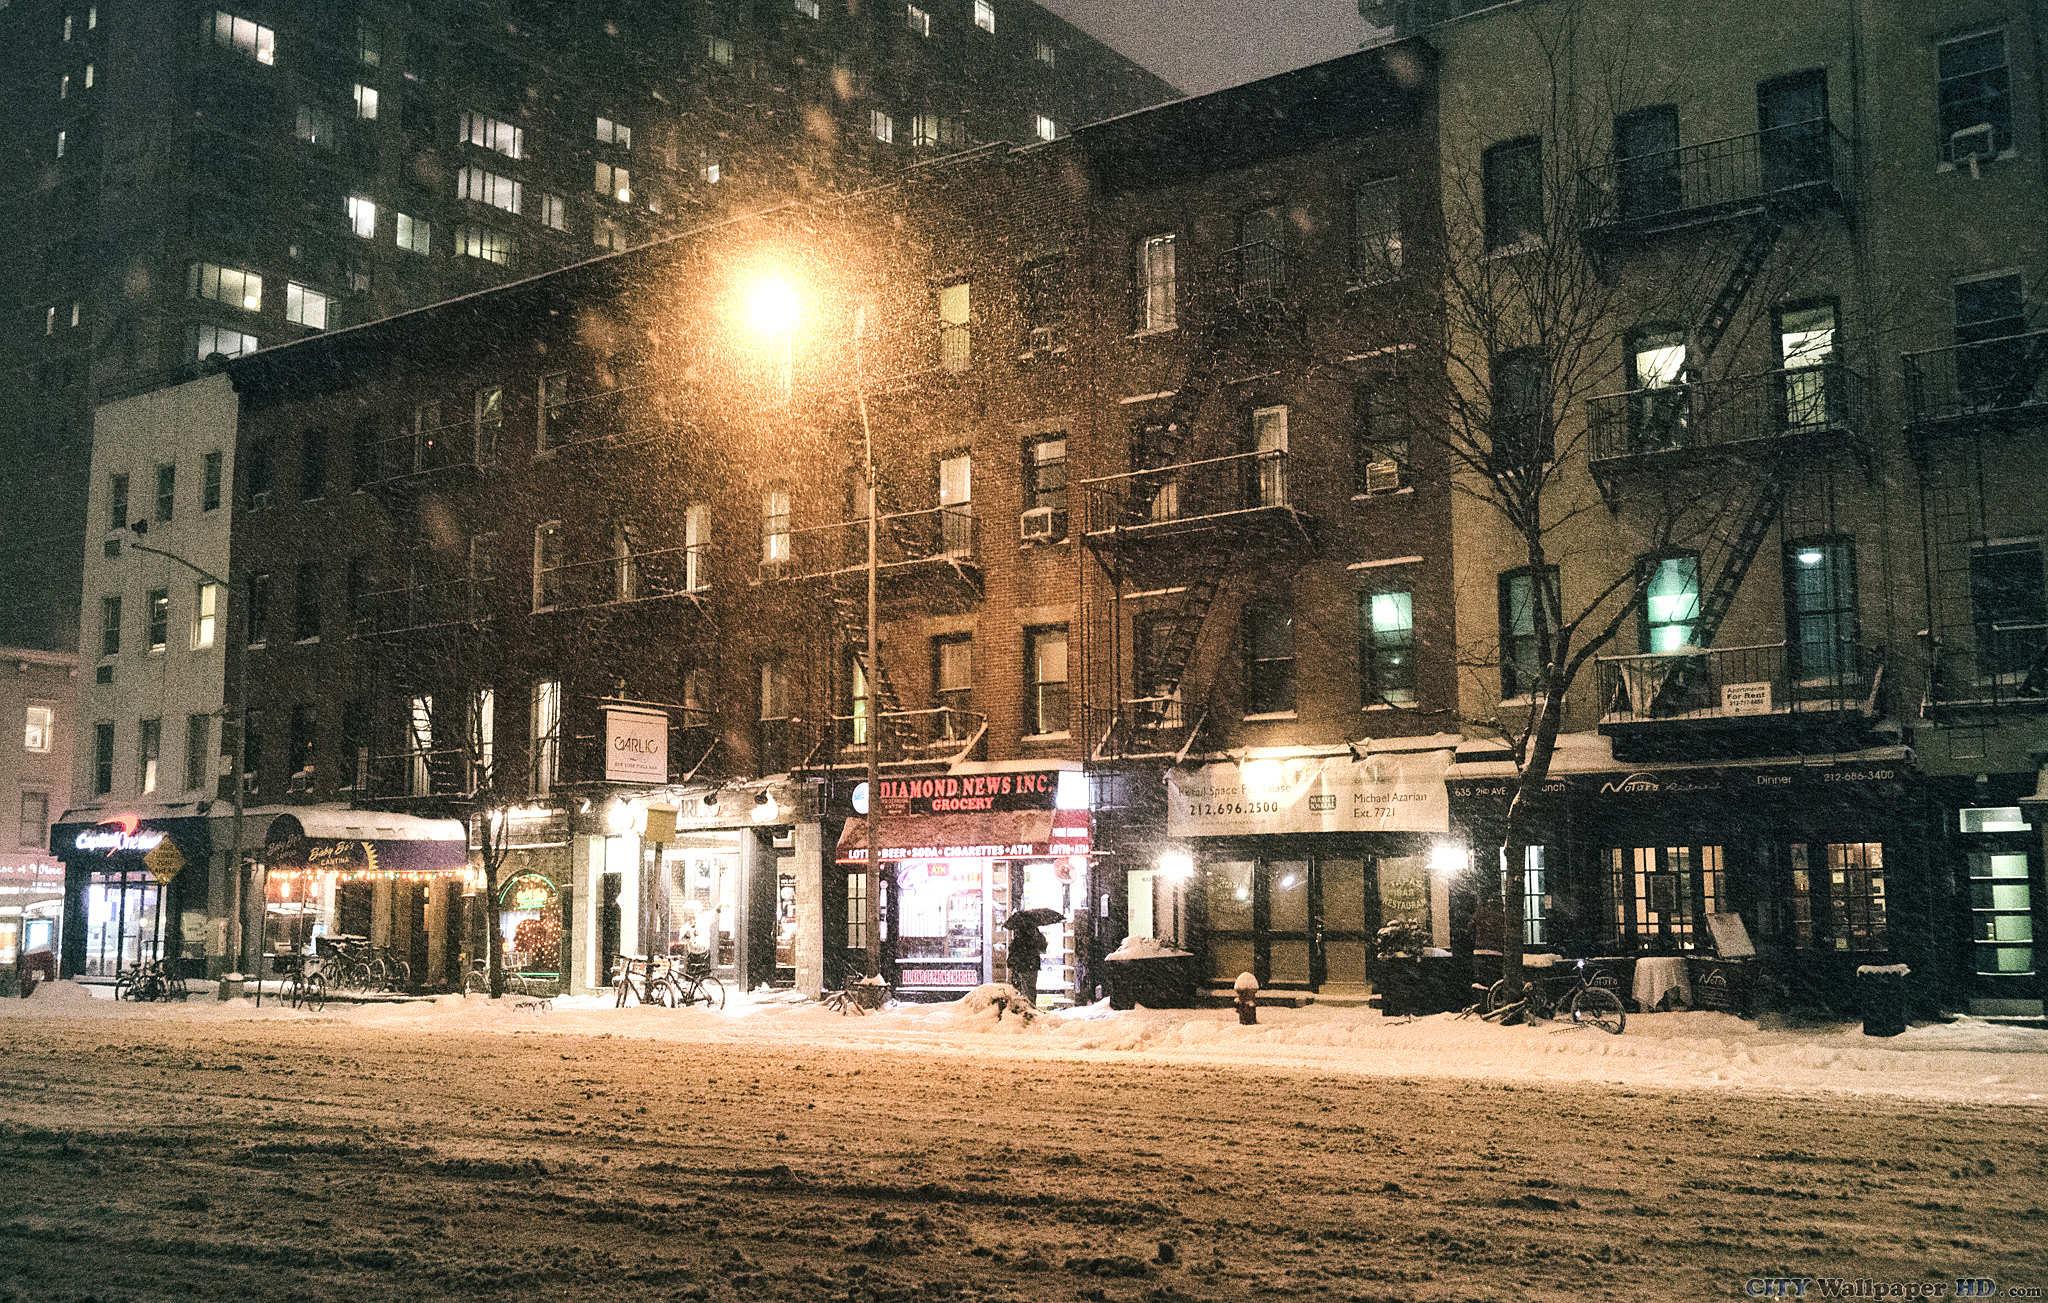 New York Winter Wallpapers Top Free New York Winter